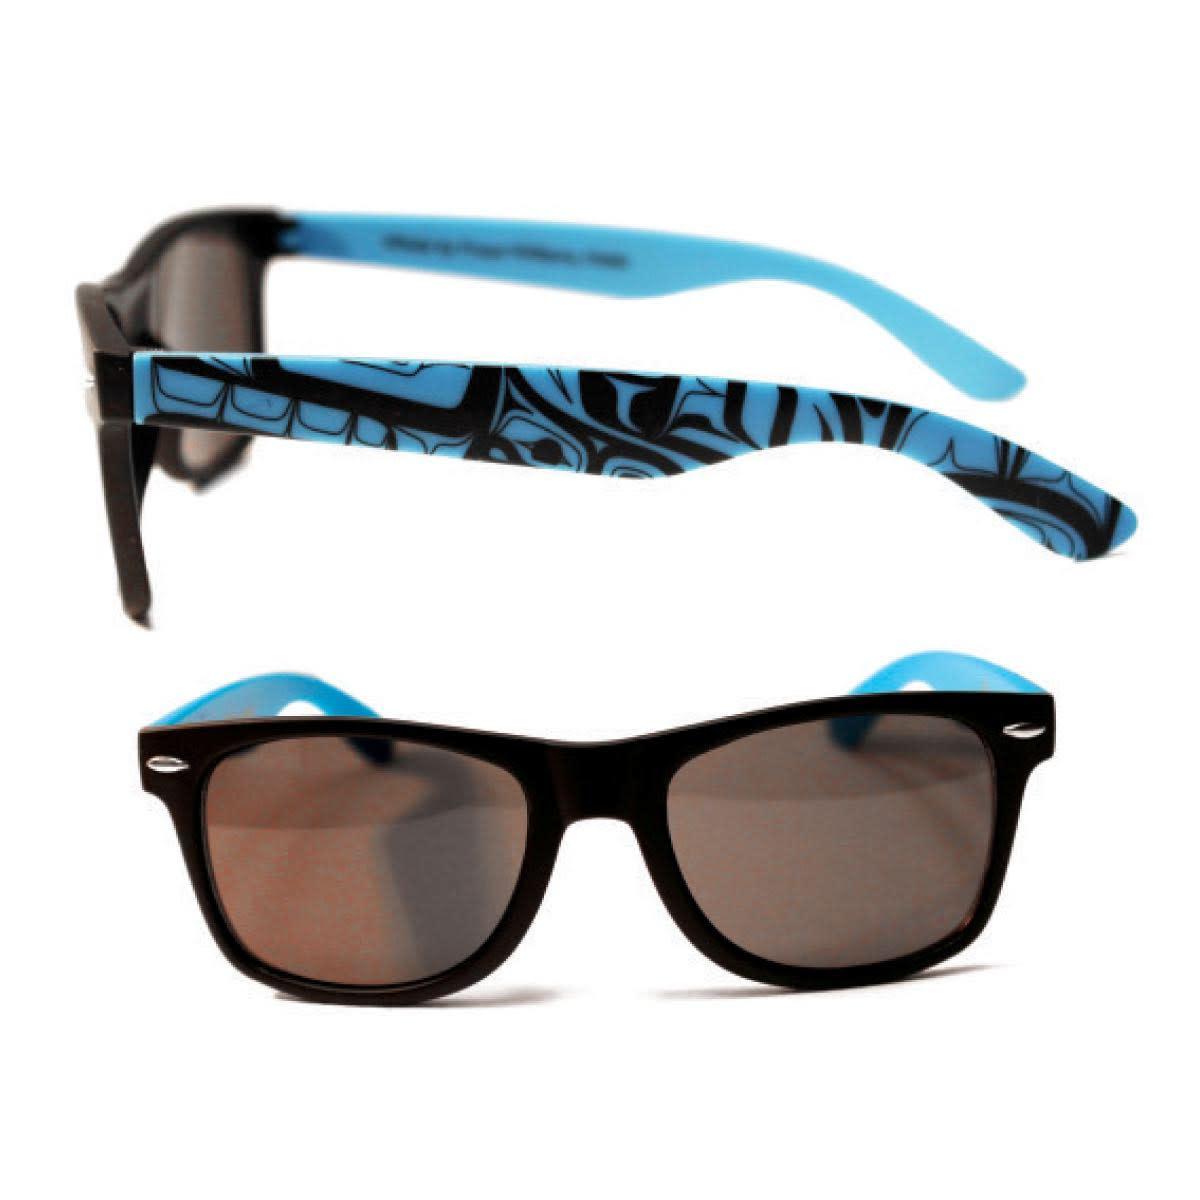 SunGlasses - Adult-5